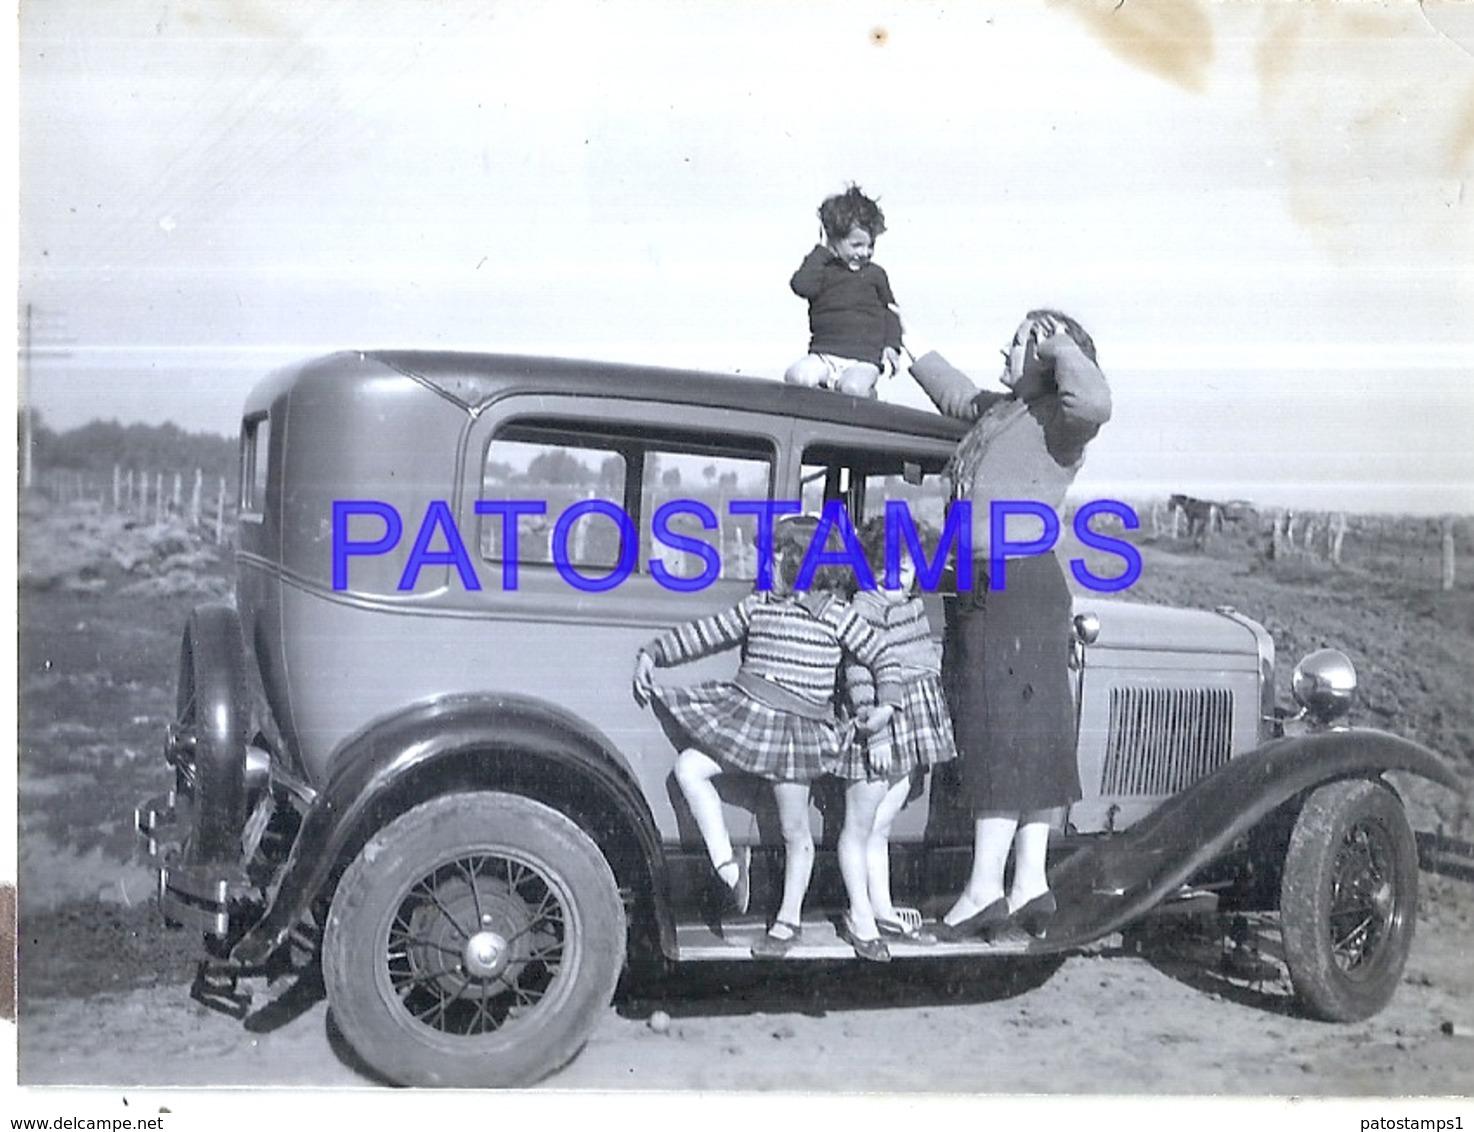 118737 AUTOMOBILE OLD CAR AUTO SEDAN AND FAMILY SPOTTED PHOTO NO POSTAL POSTCARD - Ansichtskarten